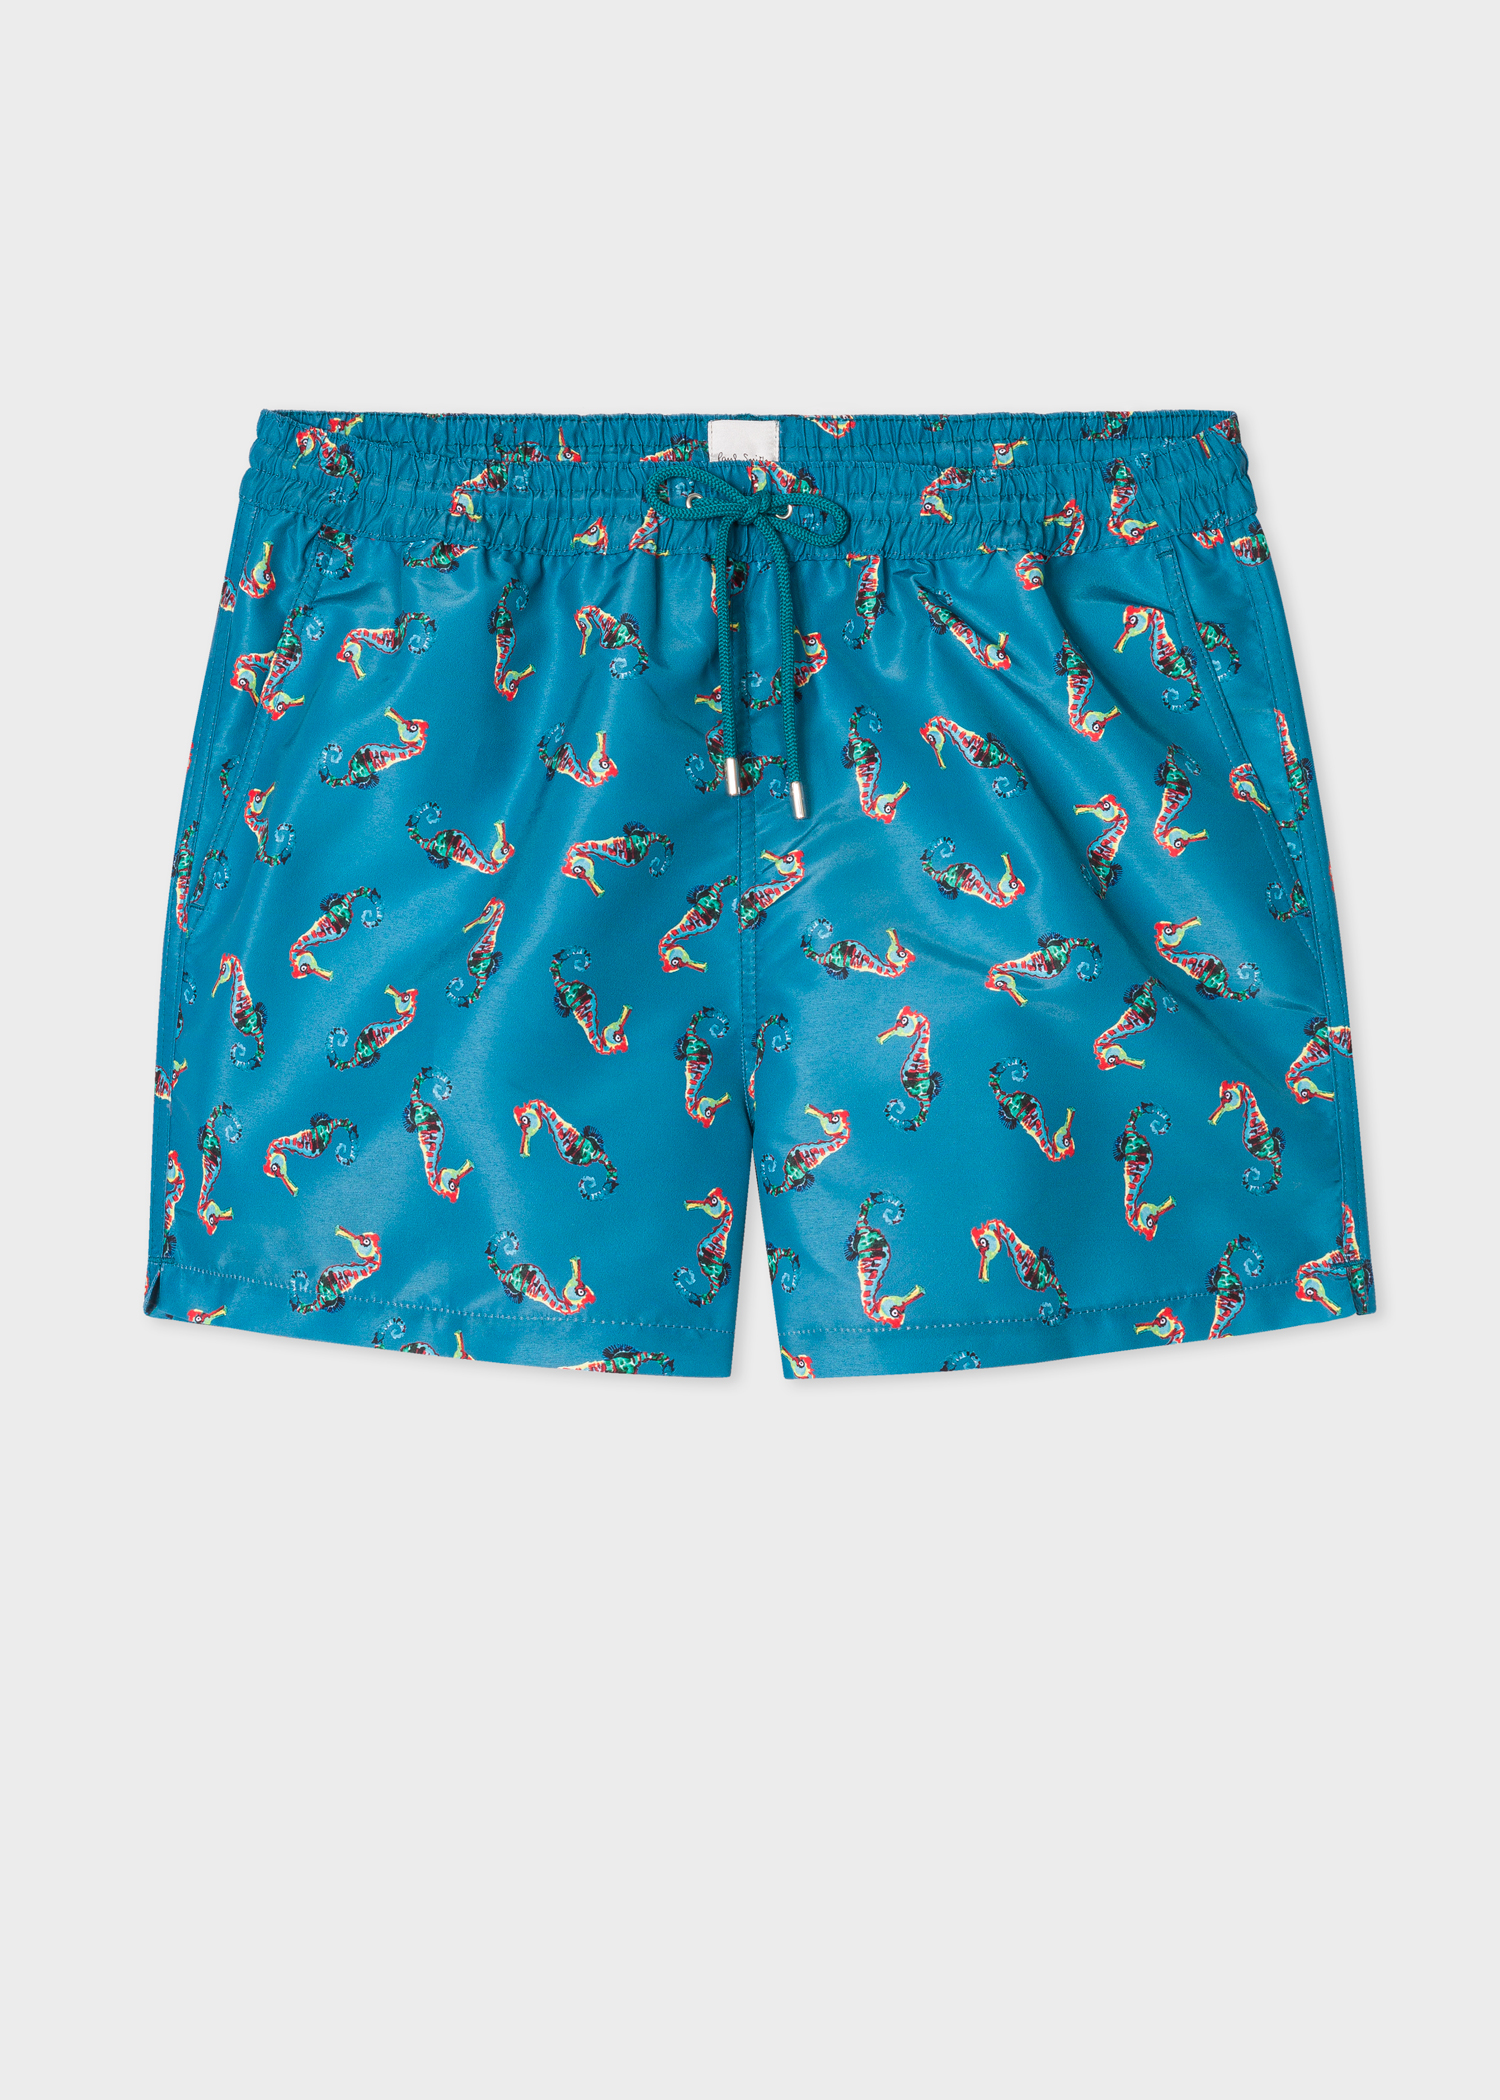 88198e1f78 Front View - Men's Petrol Blue 'Seahorse' Print Swim Shorts Paul Smith